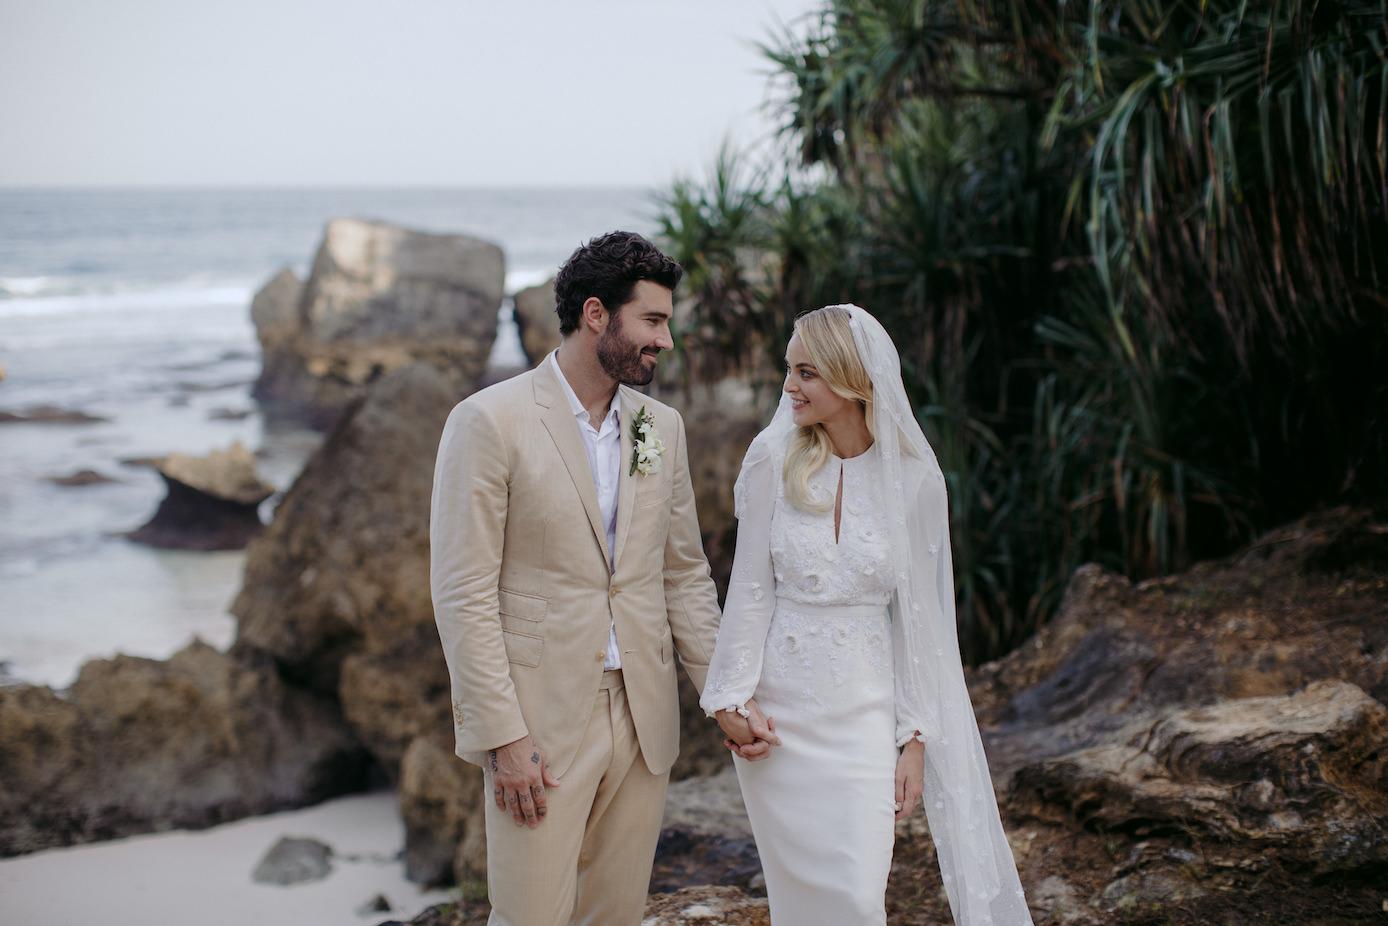 kaitlyn_brody_wedding-689.jpg